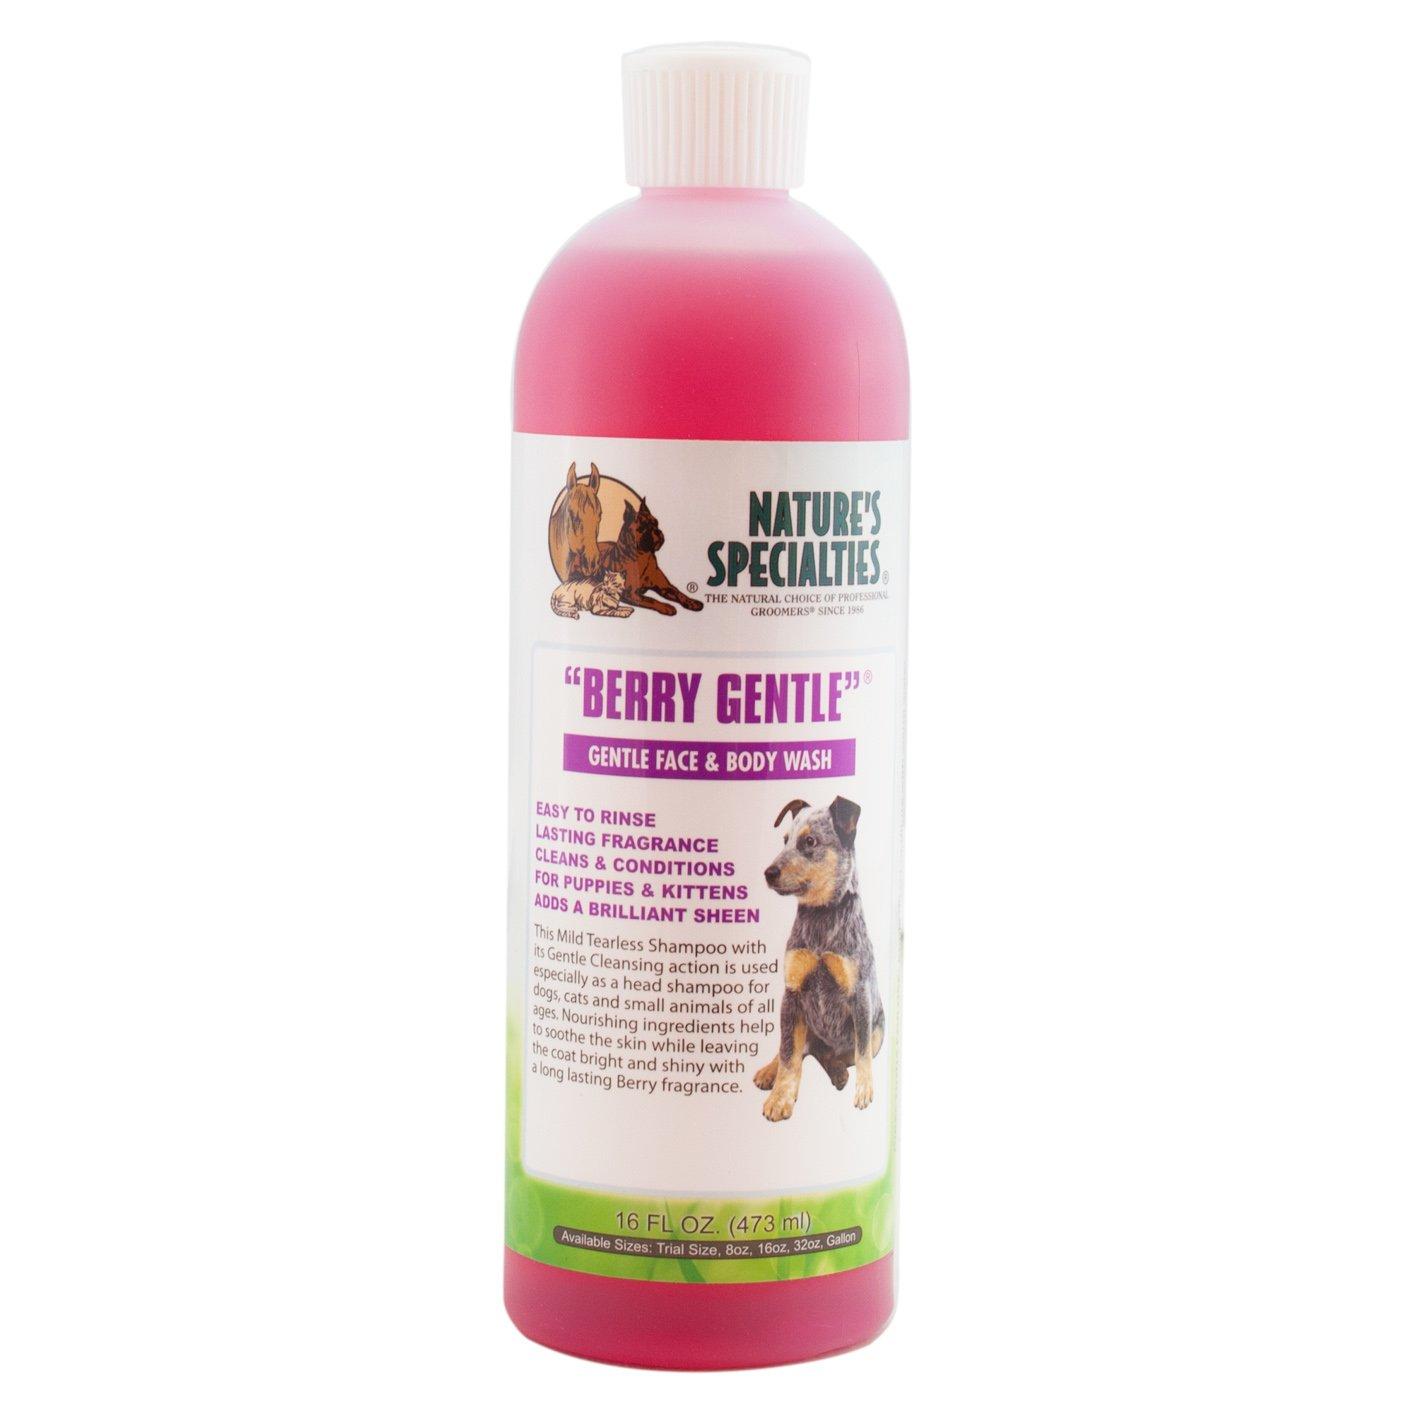 Natures Specialties Berry Gentle Dog & Cat Shampoo, 16-oz